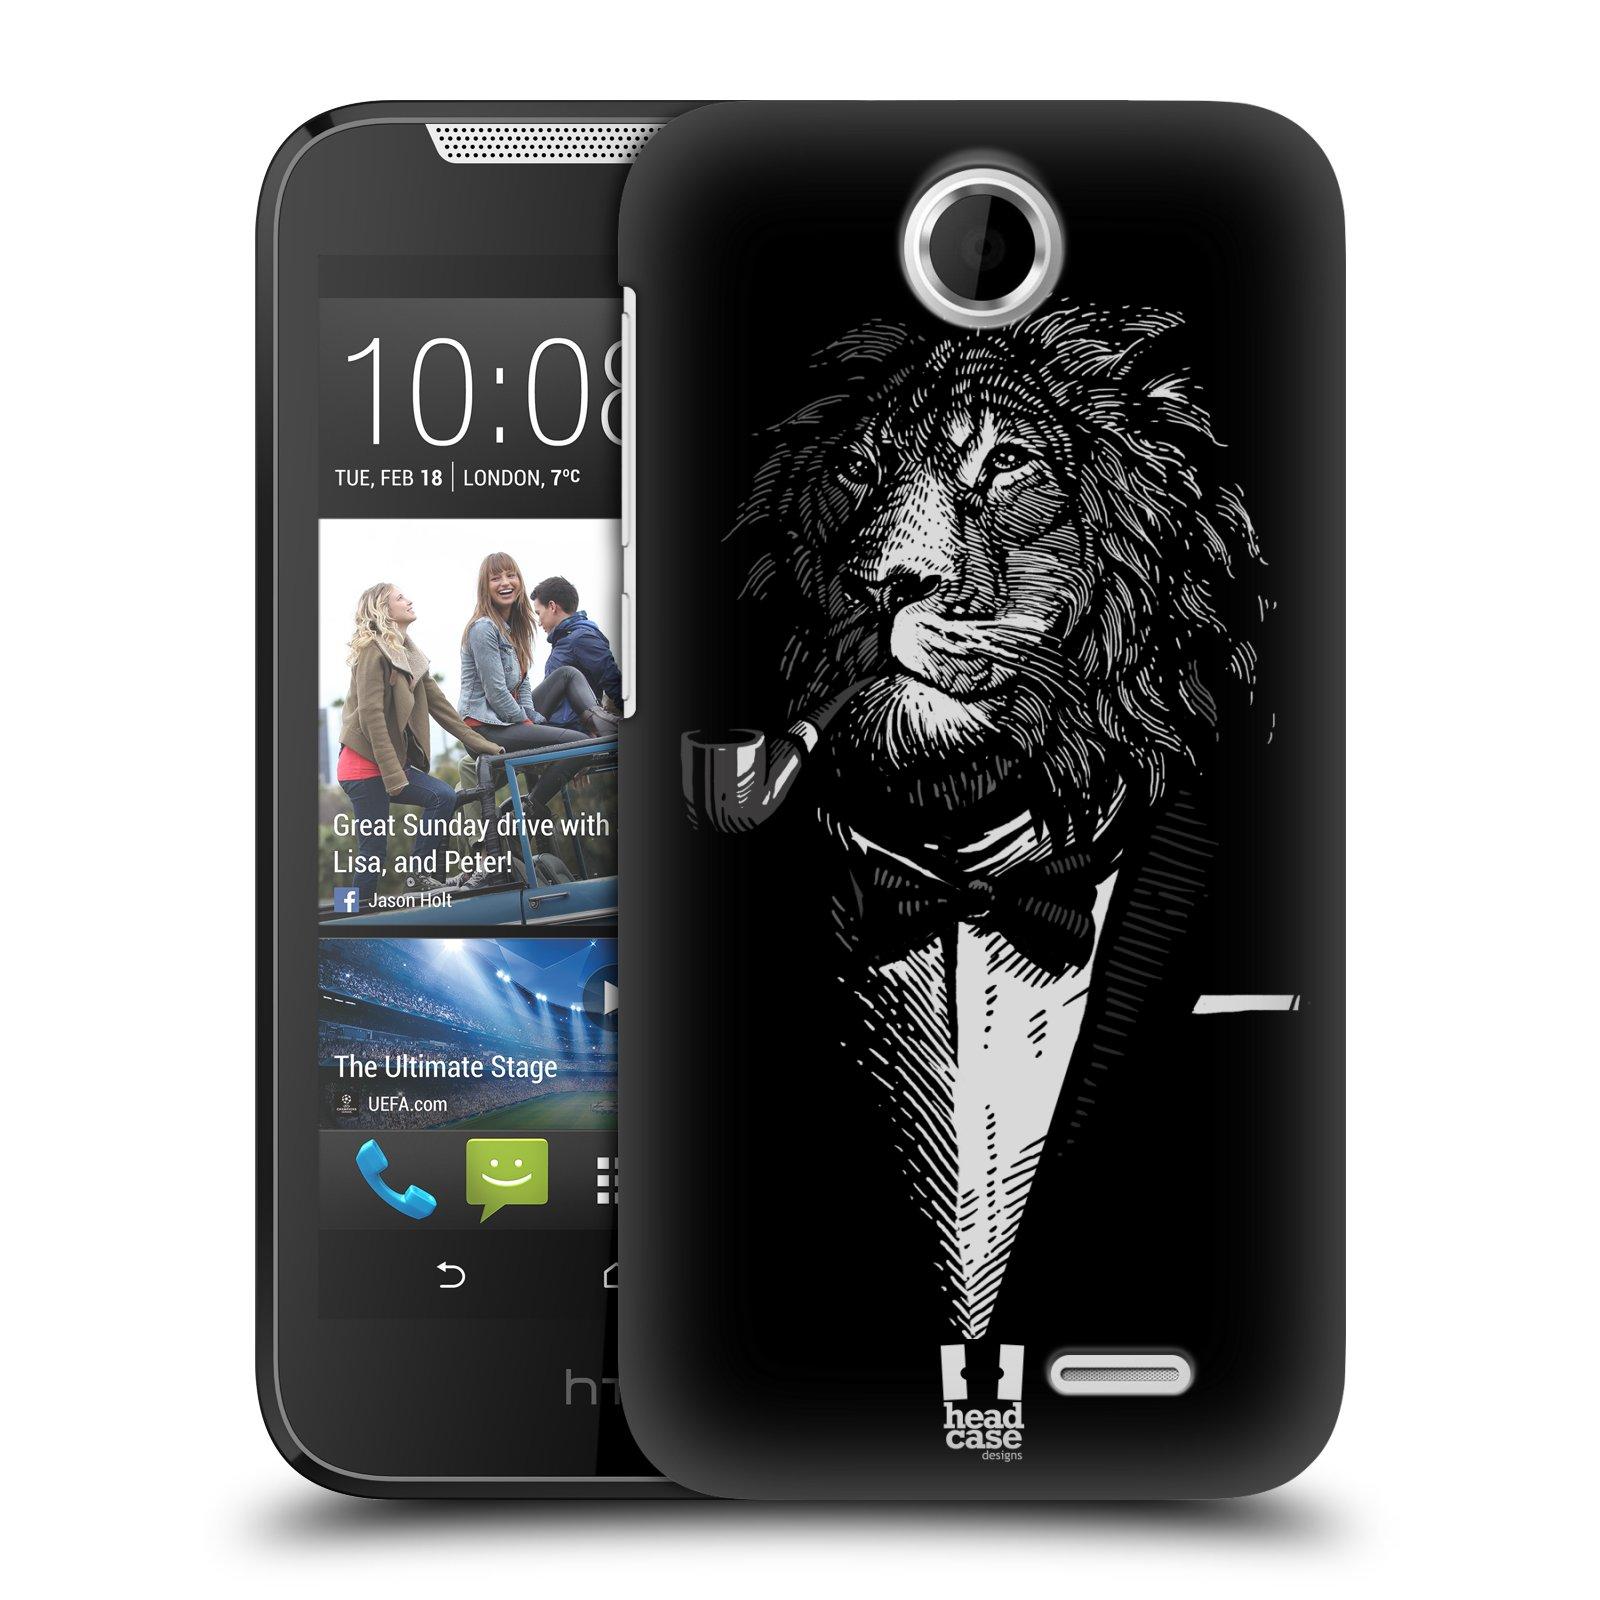 HEAD CASE plastový obal na mobil HTC Desire 310 vzor Zvíře v obleku lev